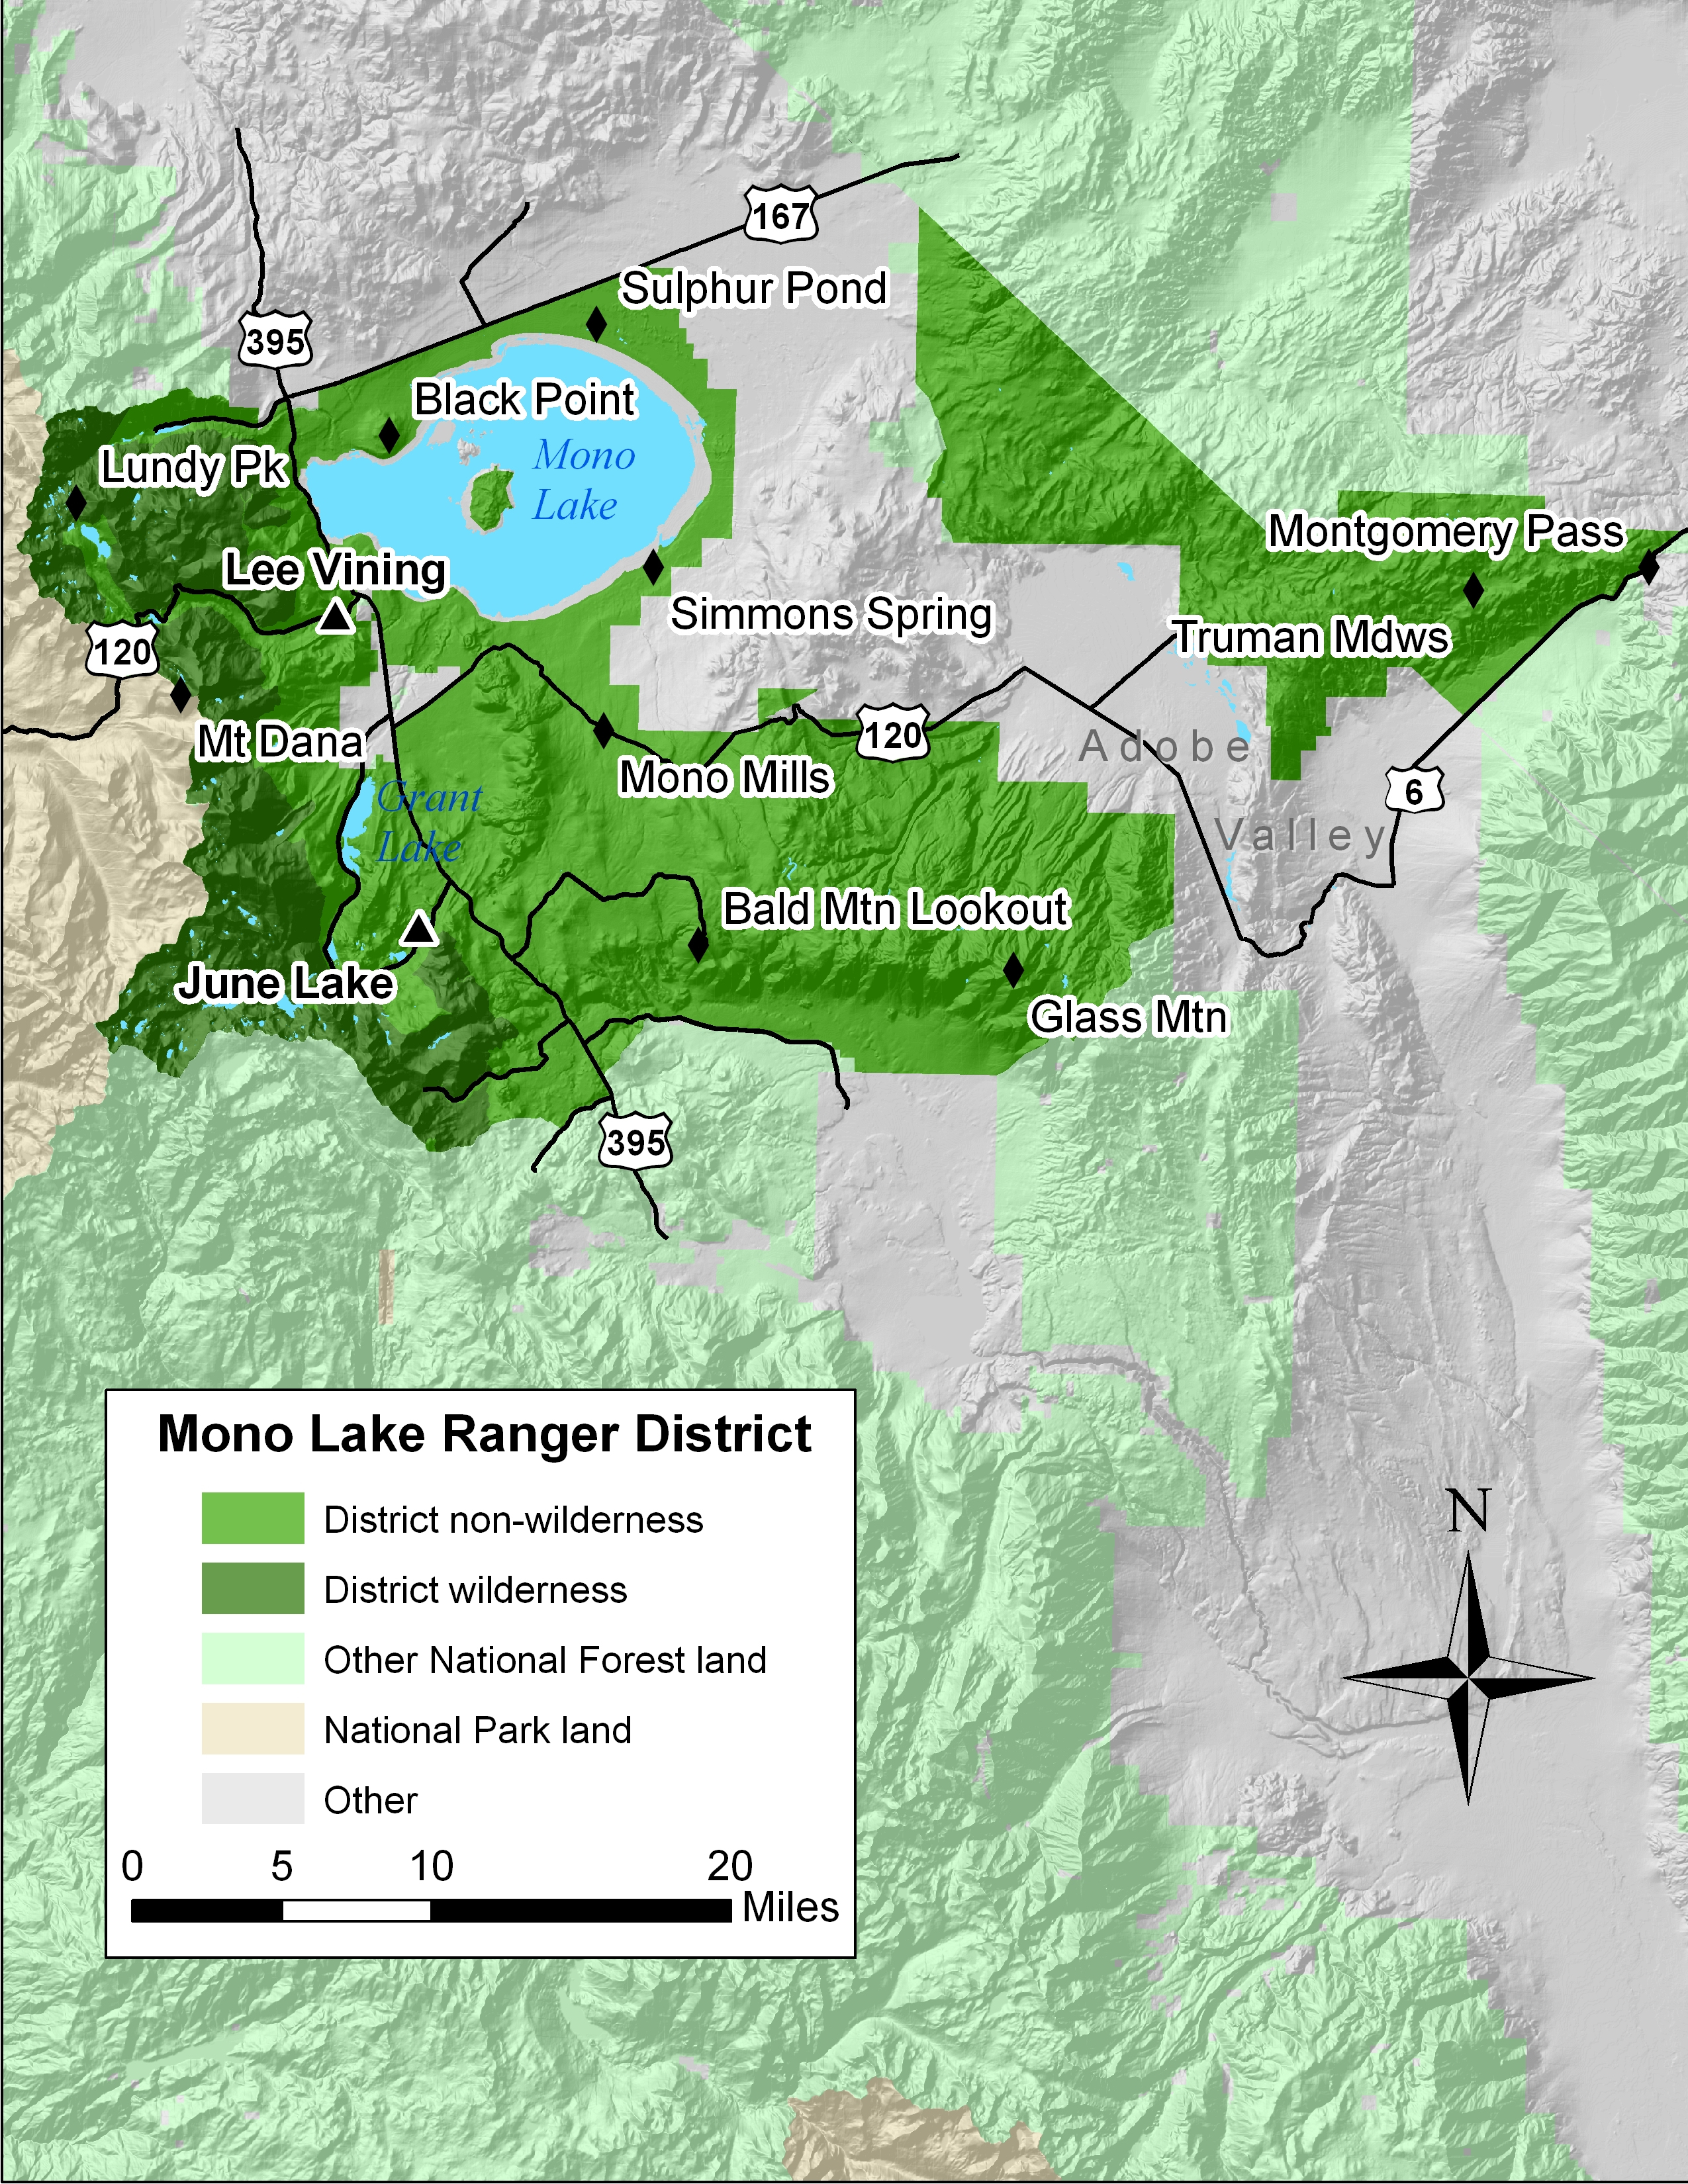 Stelprdb Map High-Quality Silver Lake California Map - Klipy - Silver Lake California Map